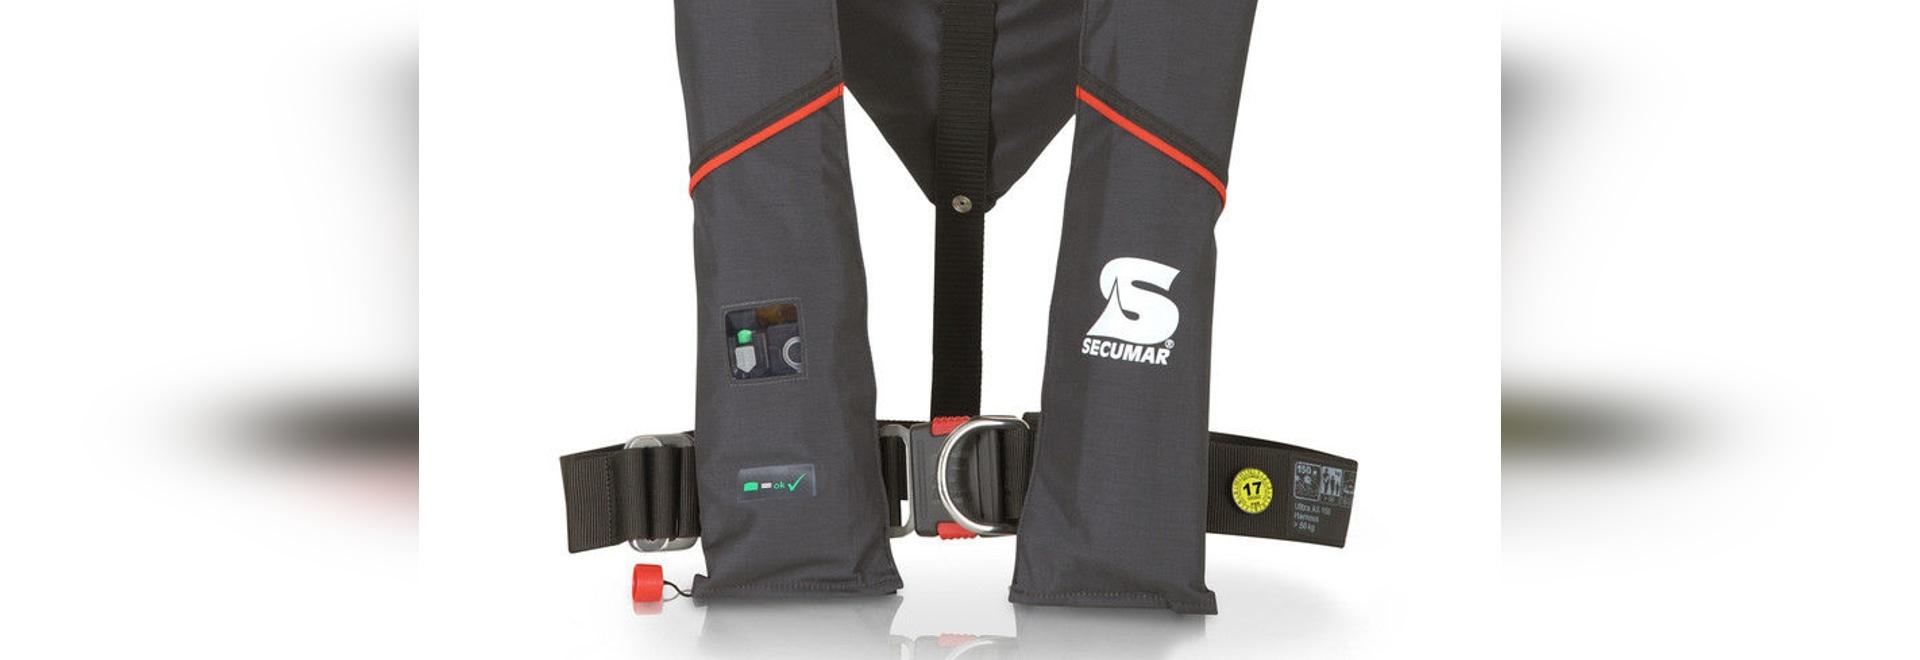 NEW: inflatable lifejacket by Secumar